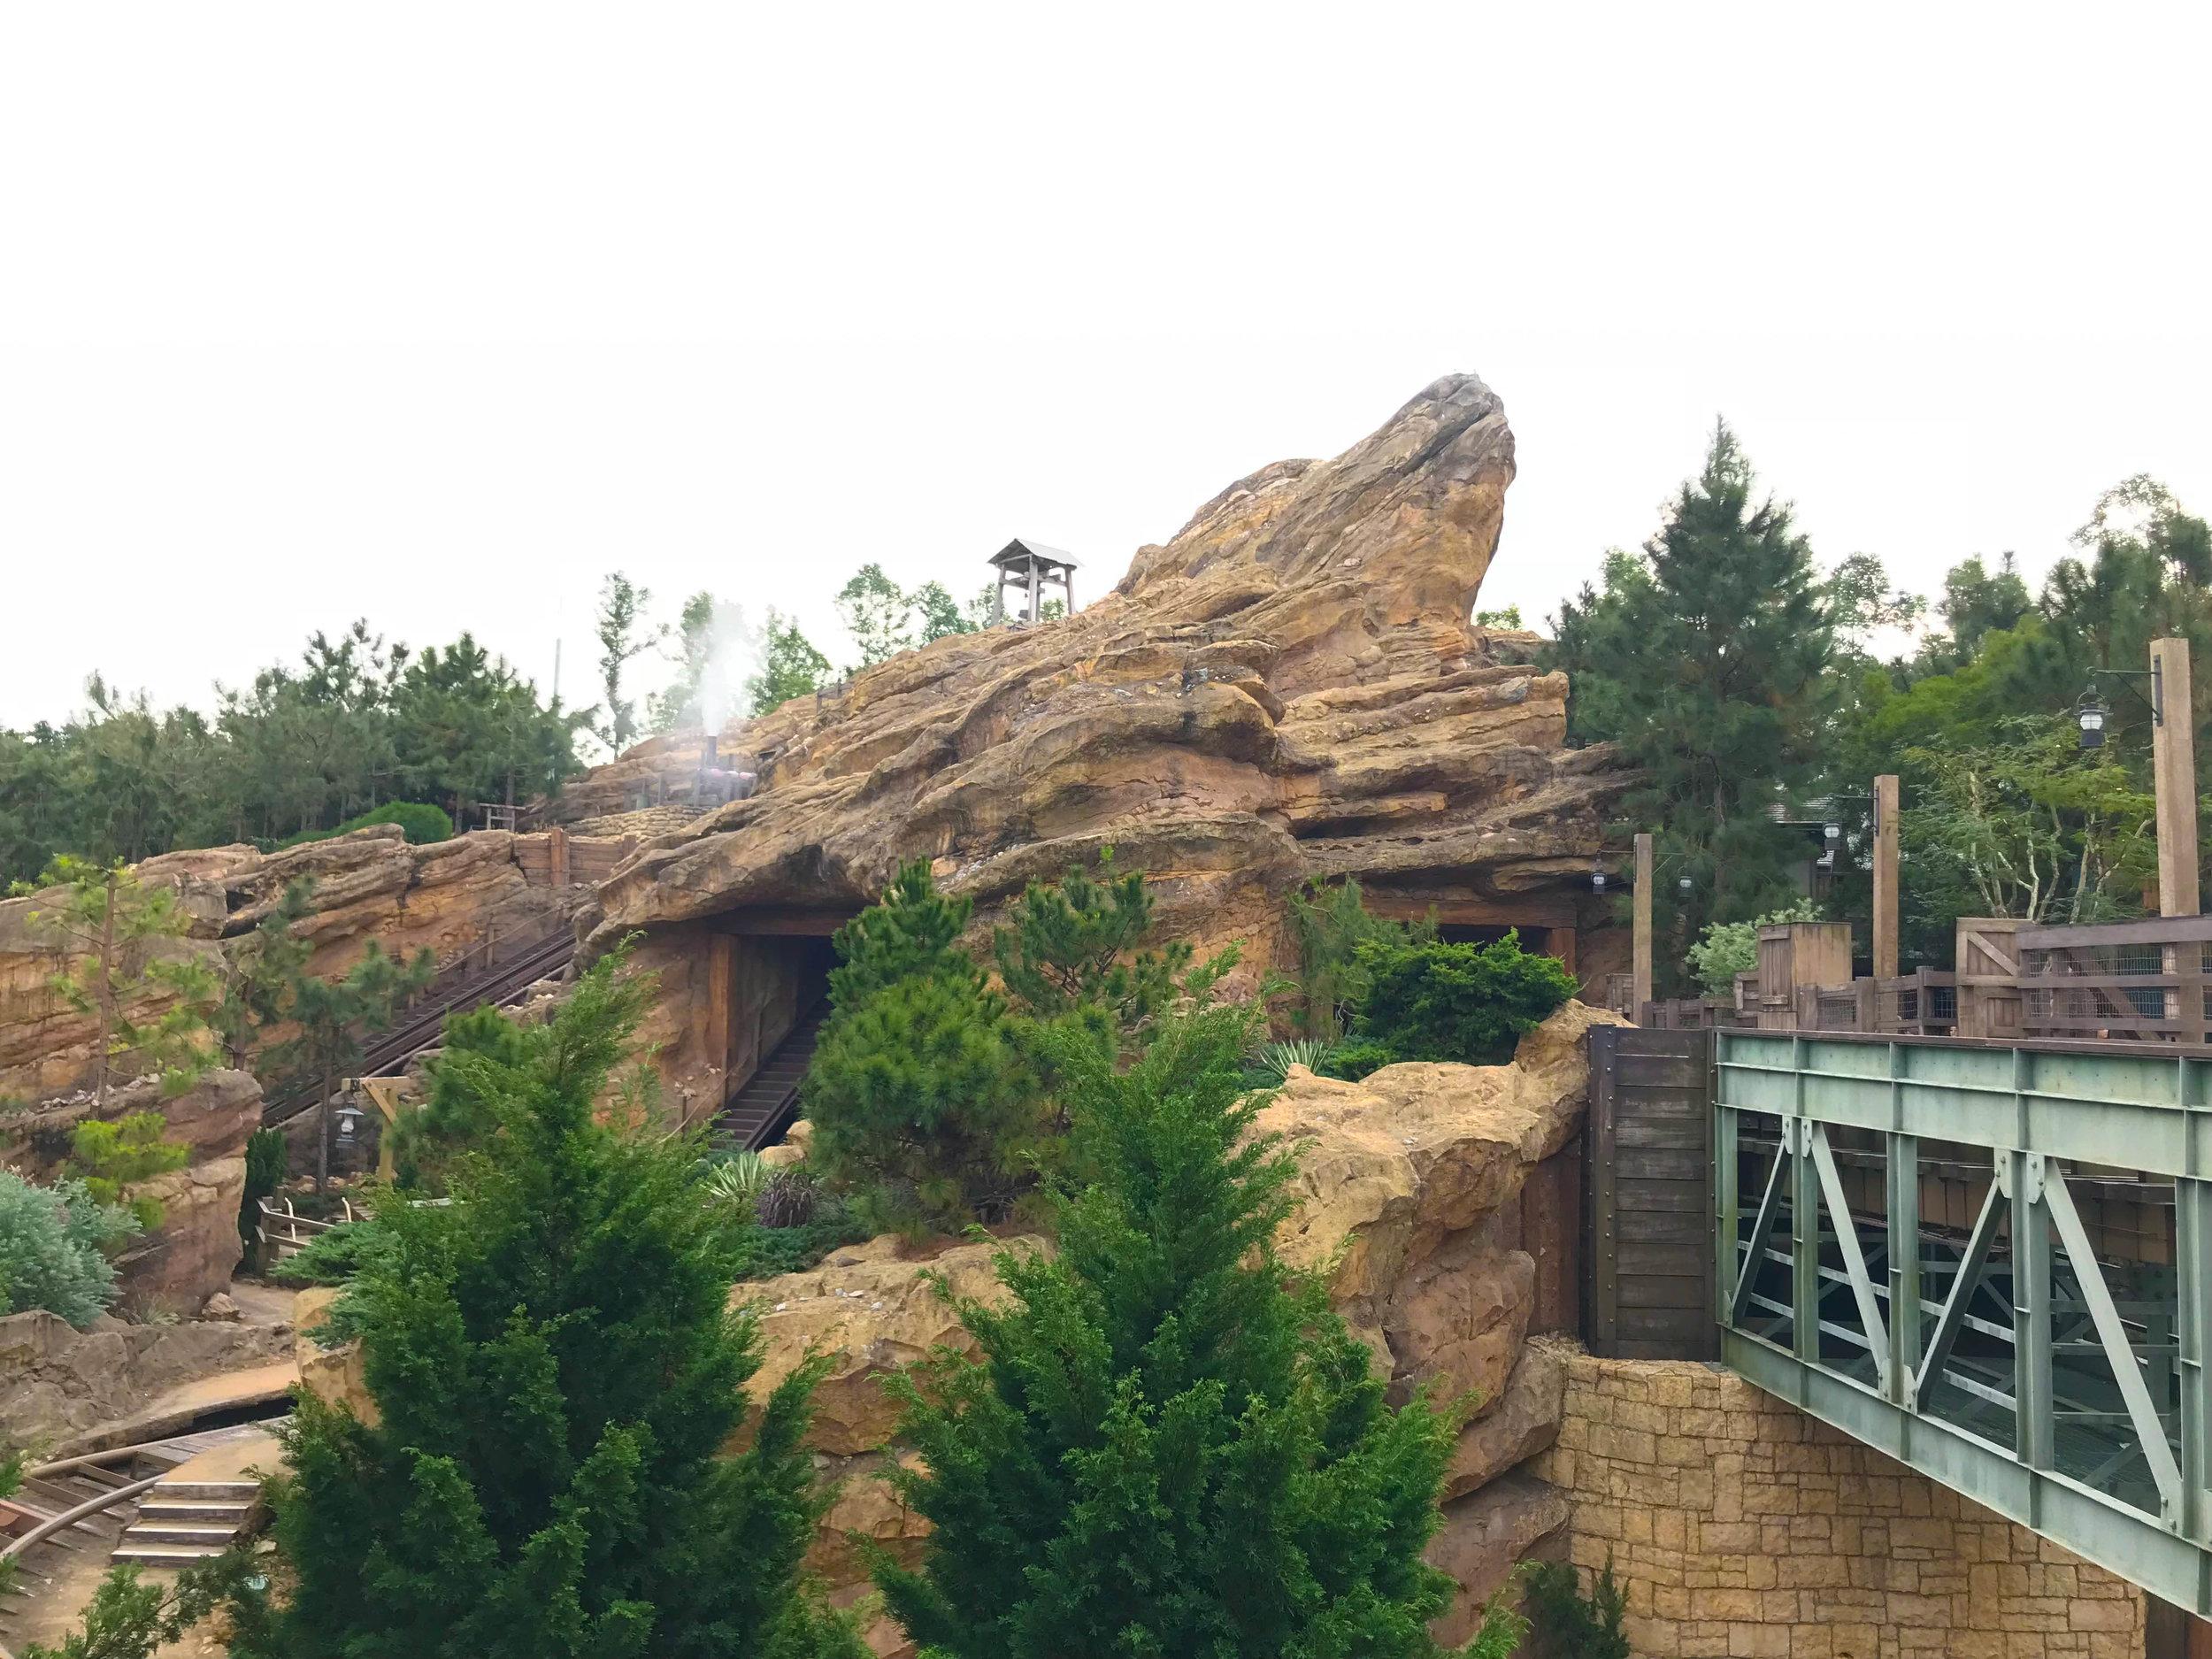 Hong-Kong-Disneyland-frontierland-grizzly-gulch.jpg